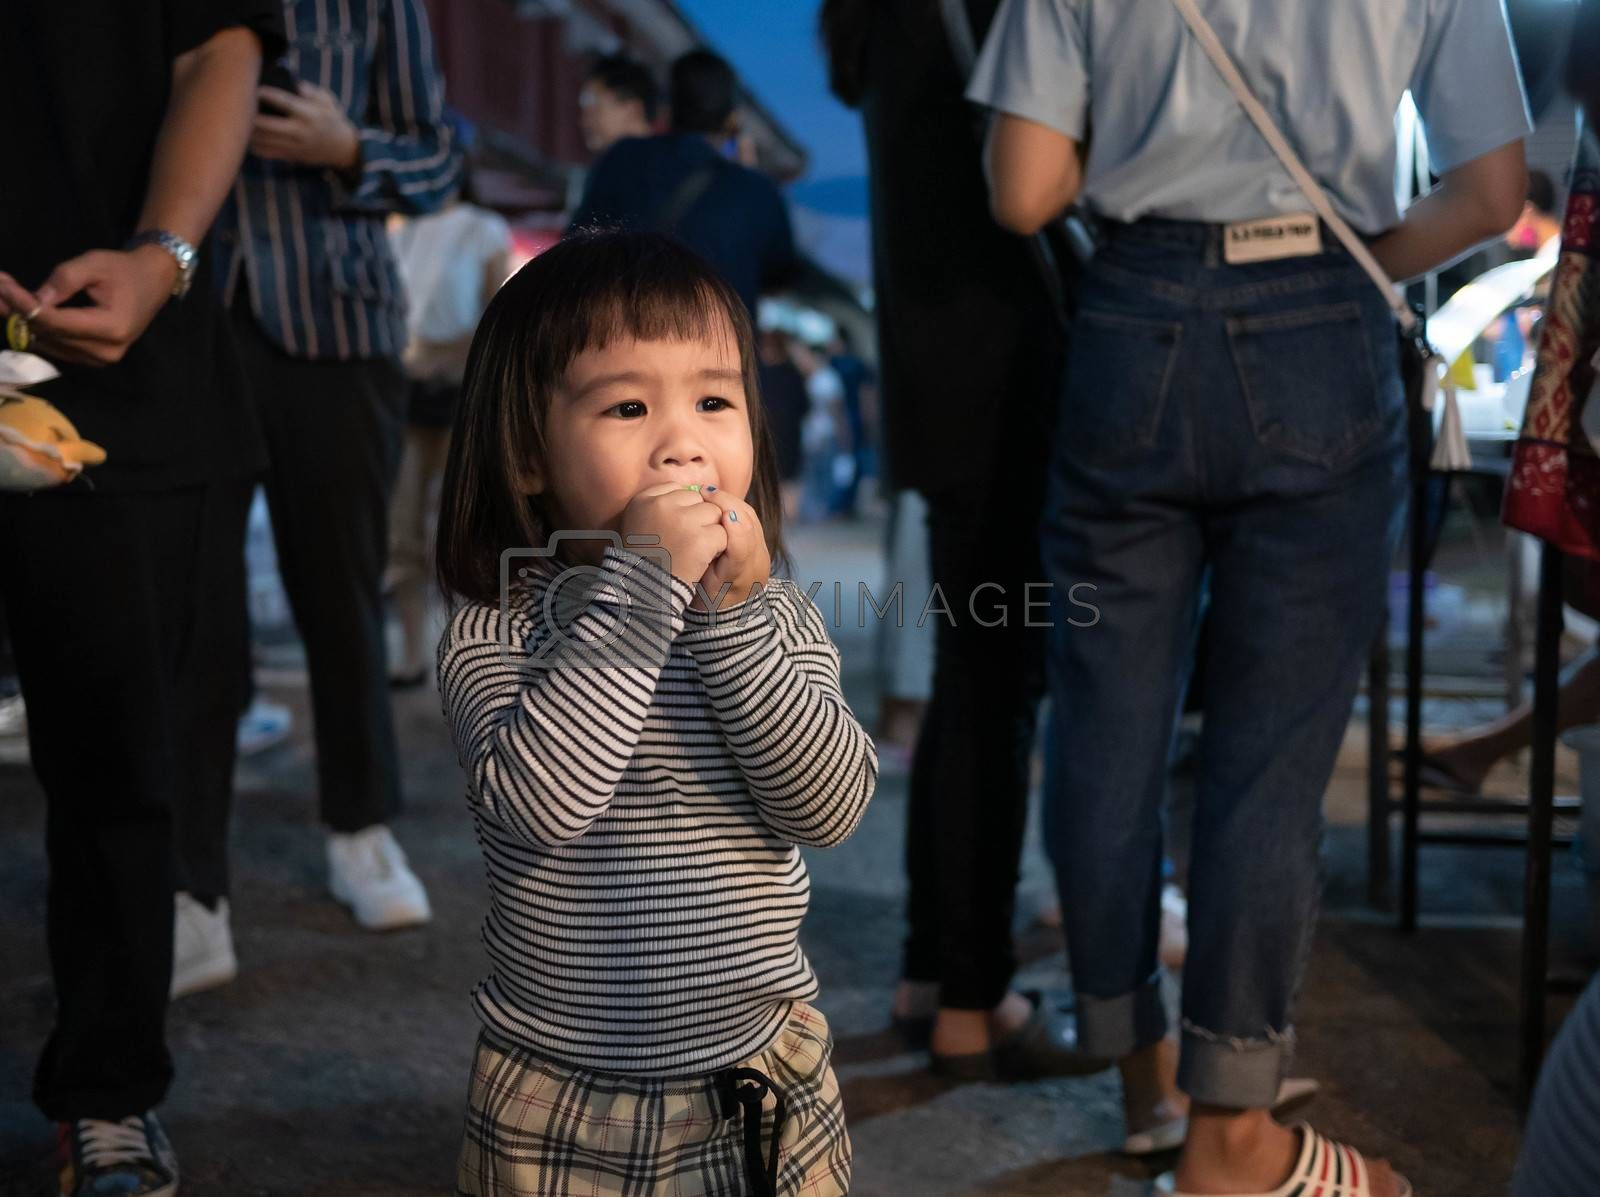 Lampang, Thailand; 5 October 2019 - Adorable Asian child girl having fun with Dracula teeth plastic toys in Kad Kong Ta Walking Street. by TEERASAK